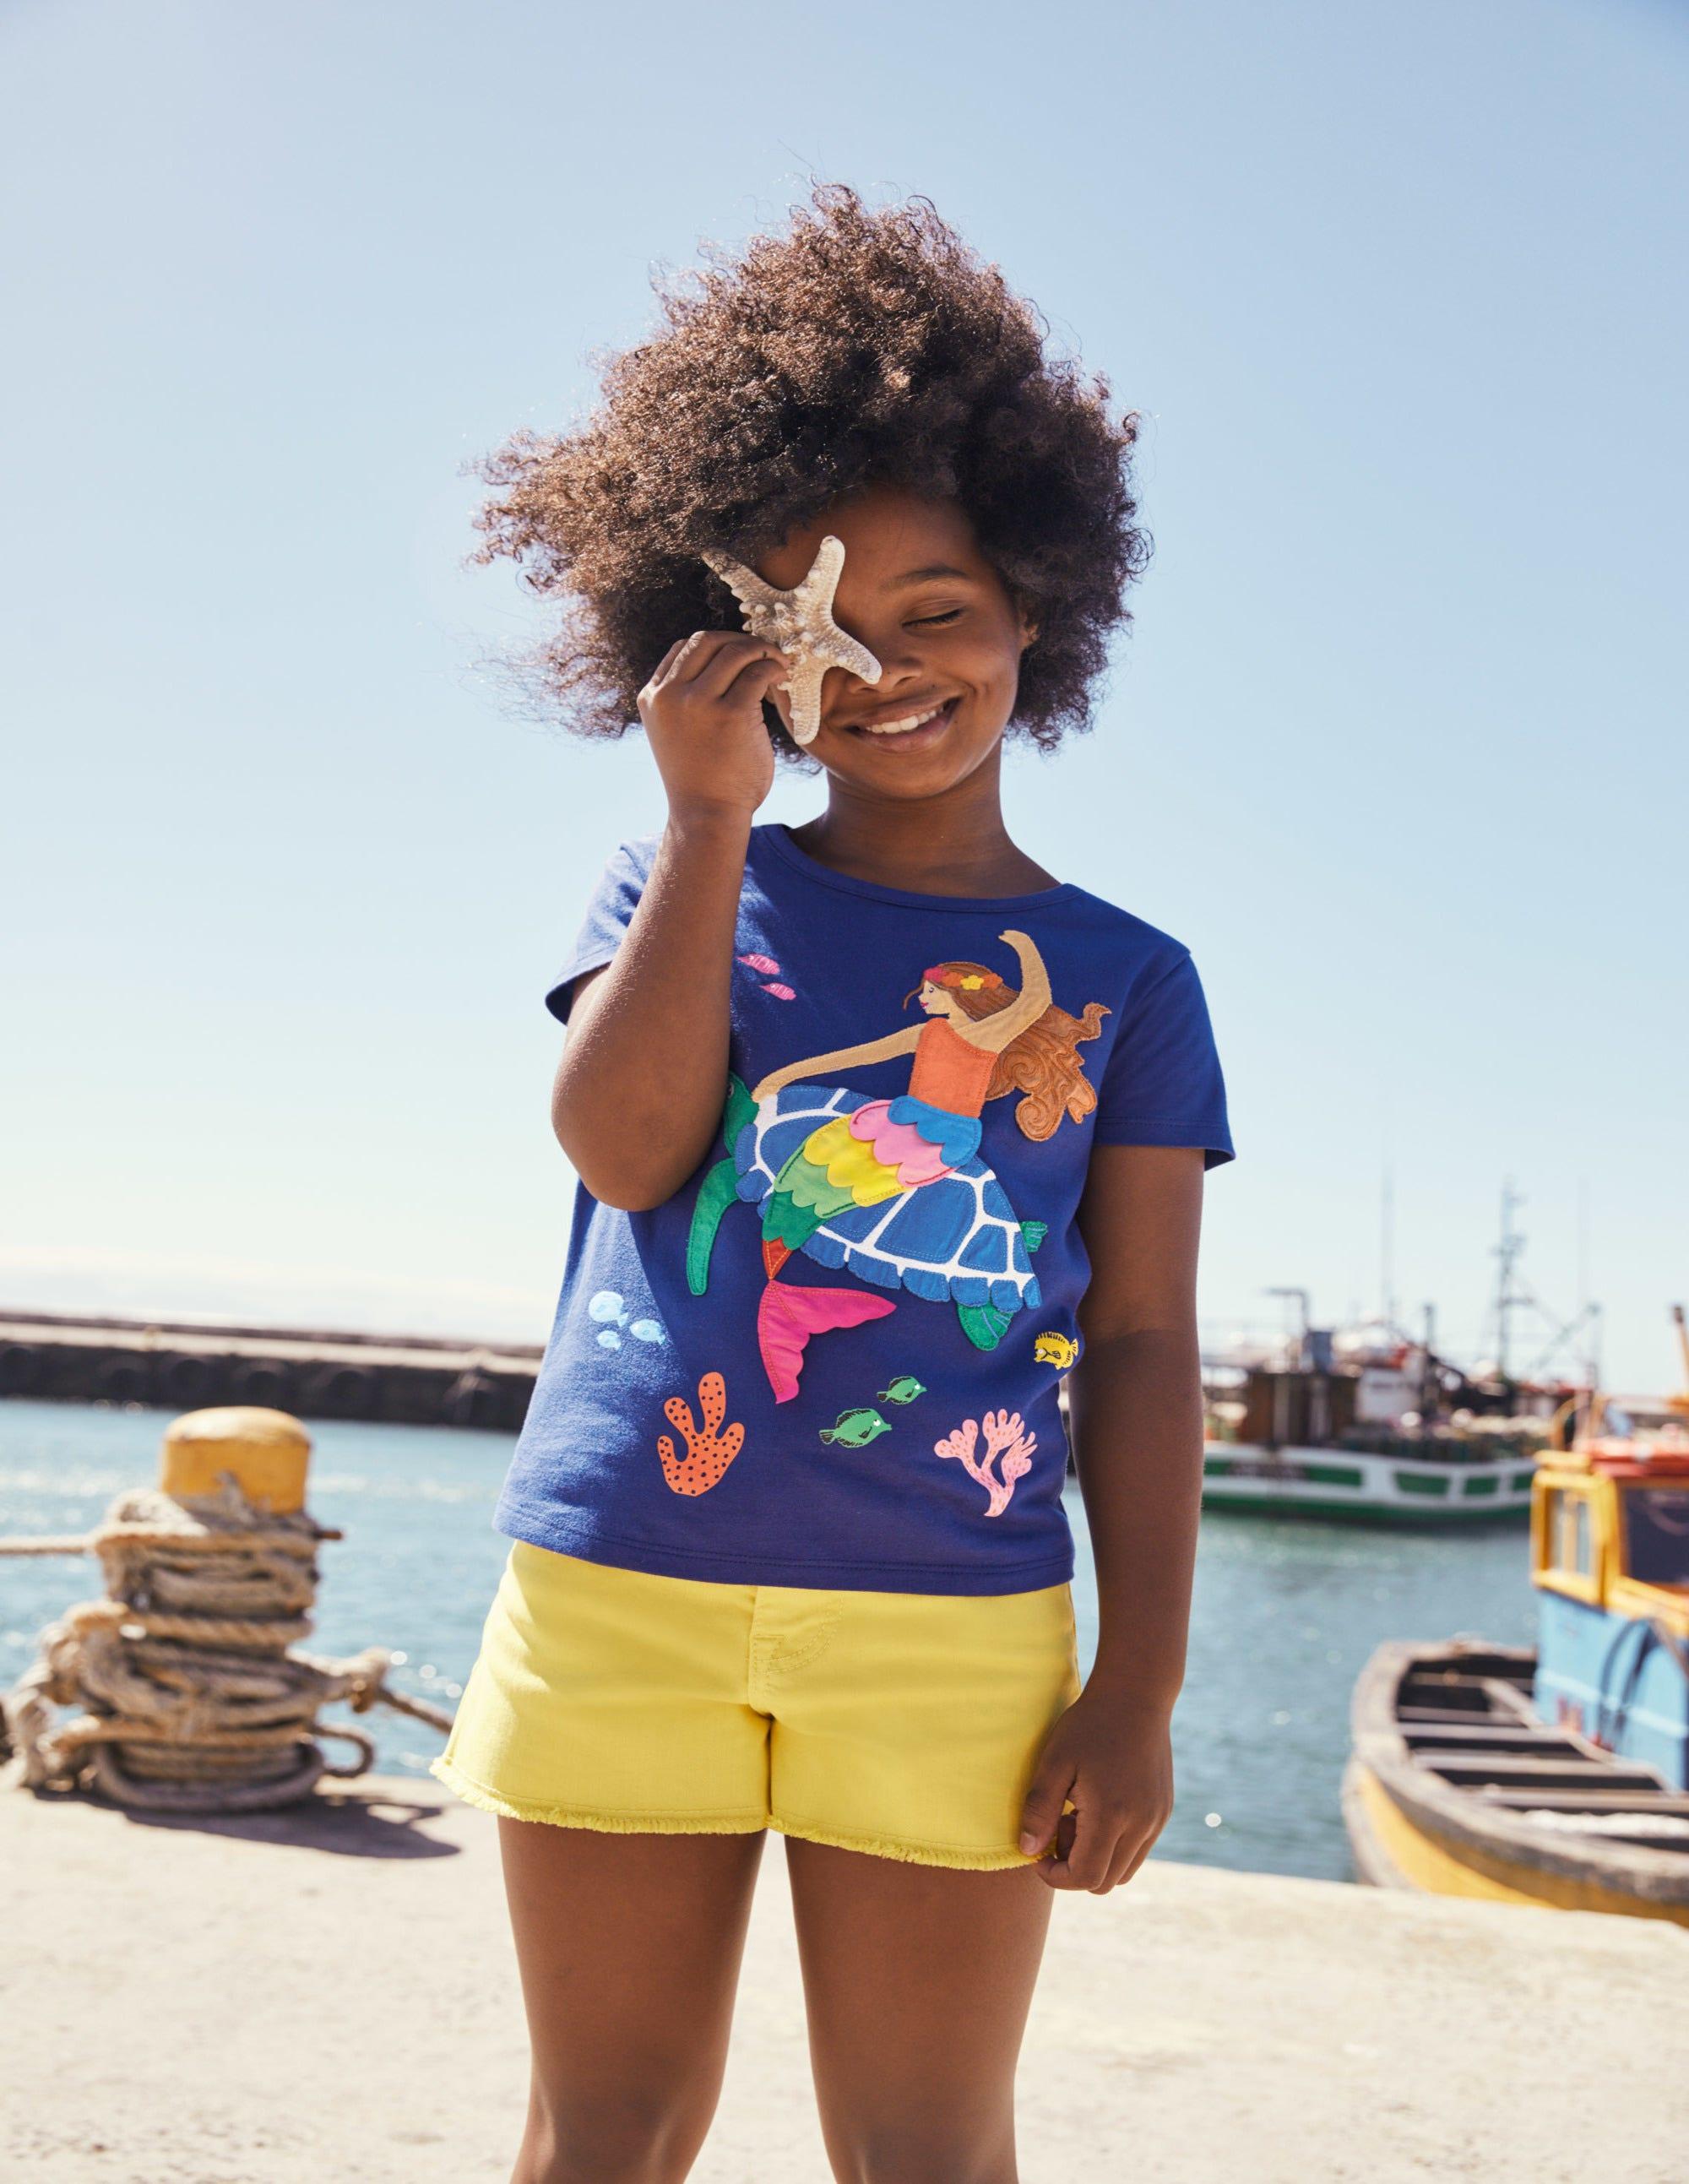 Boden Big Applique T-shirt - Starboard Blue Mermaid